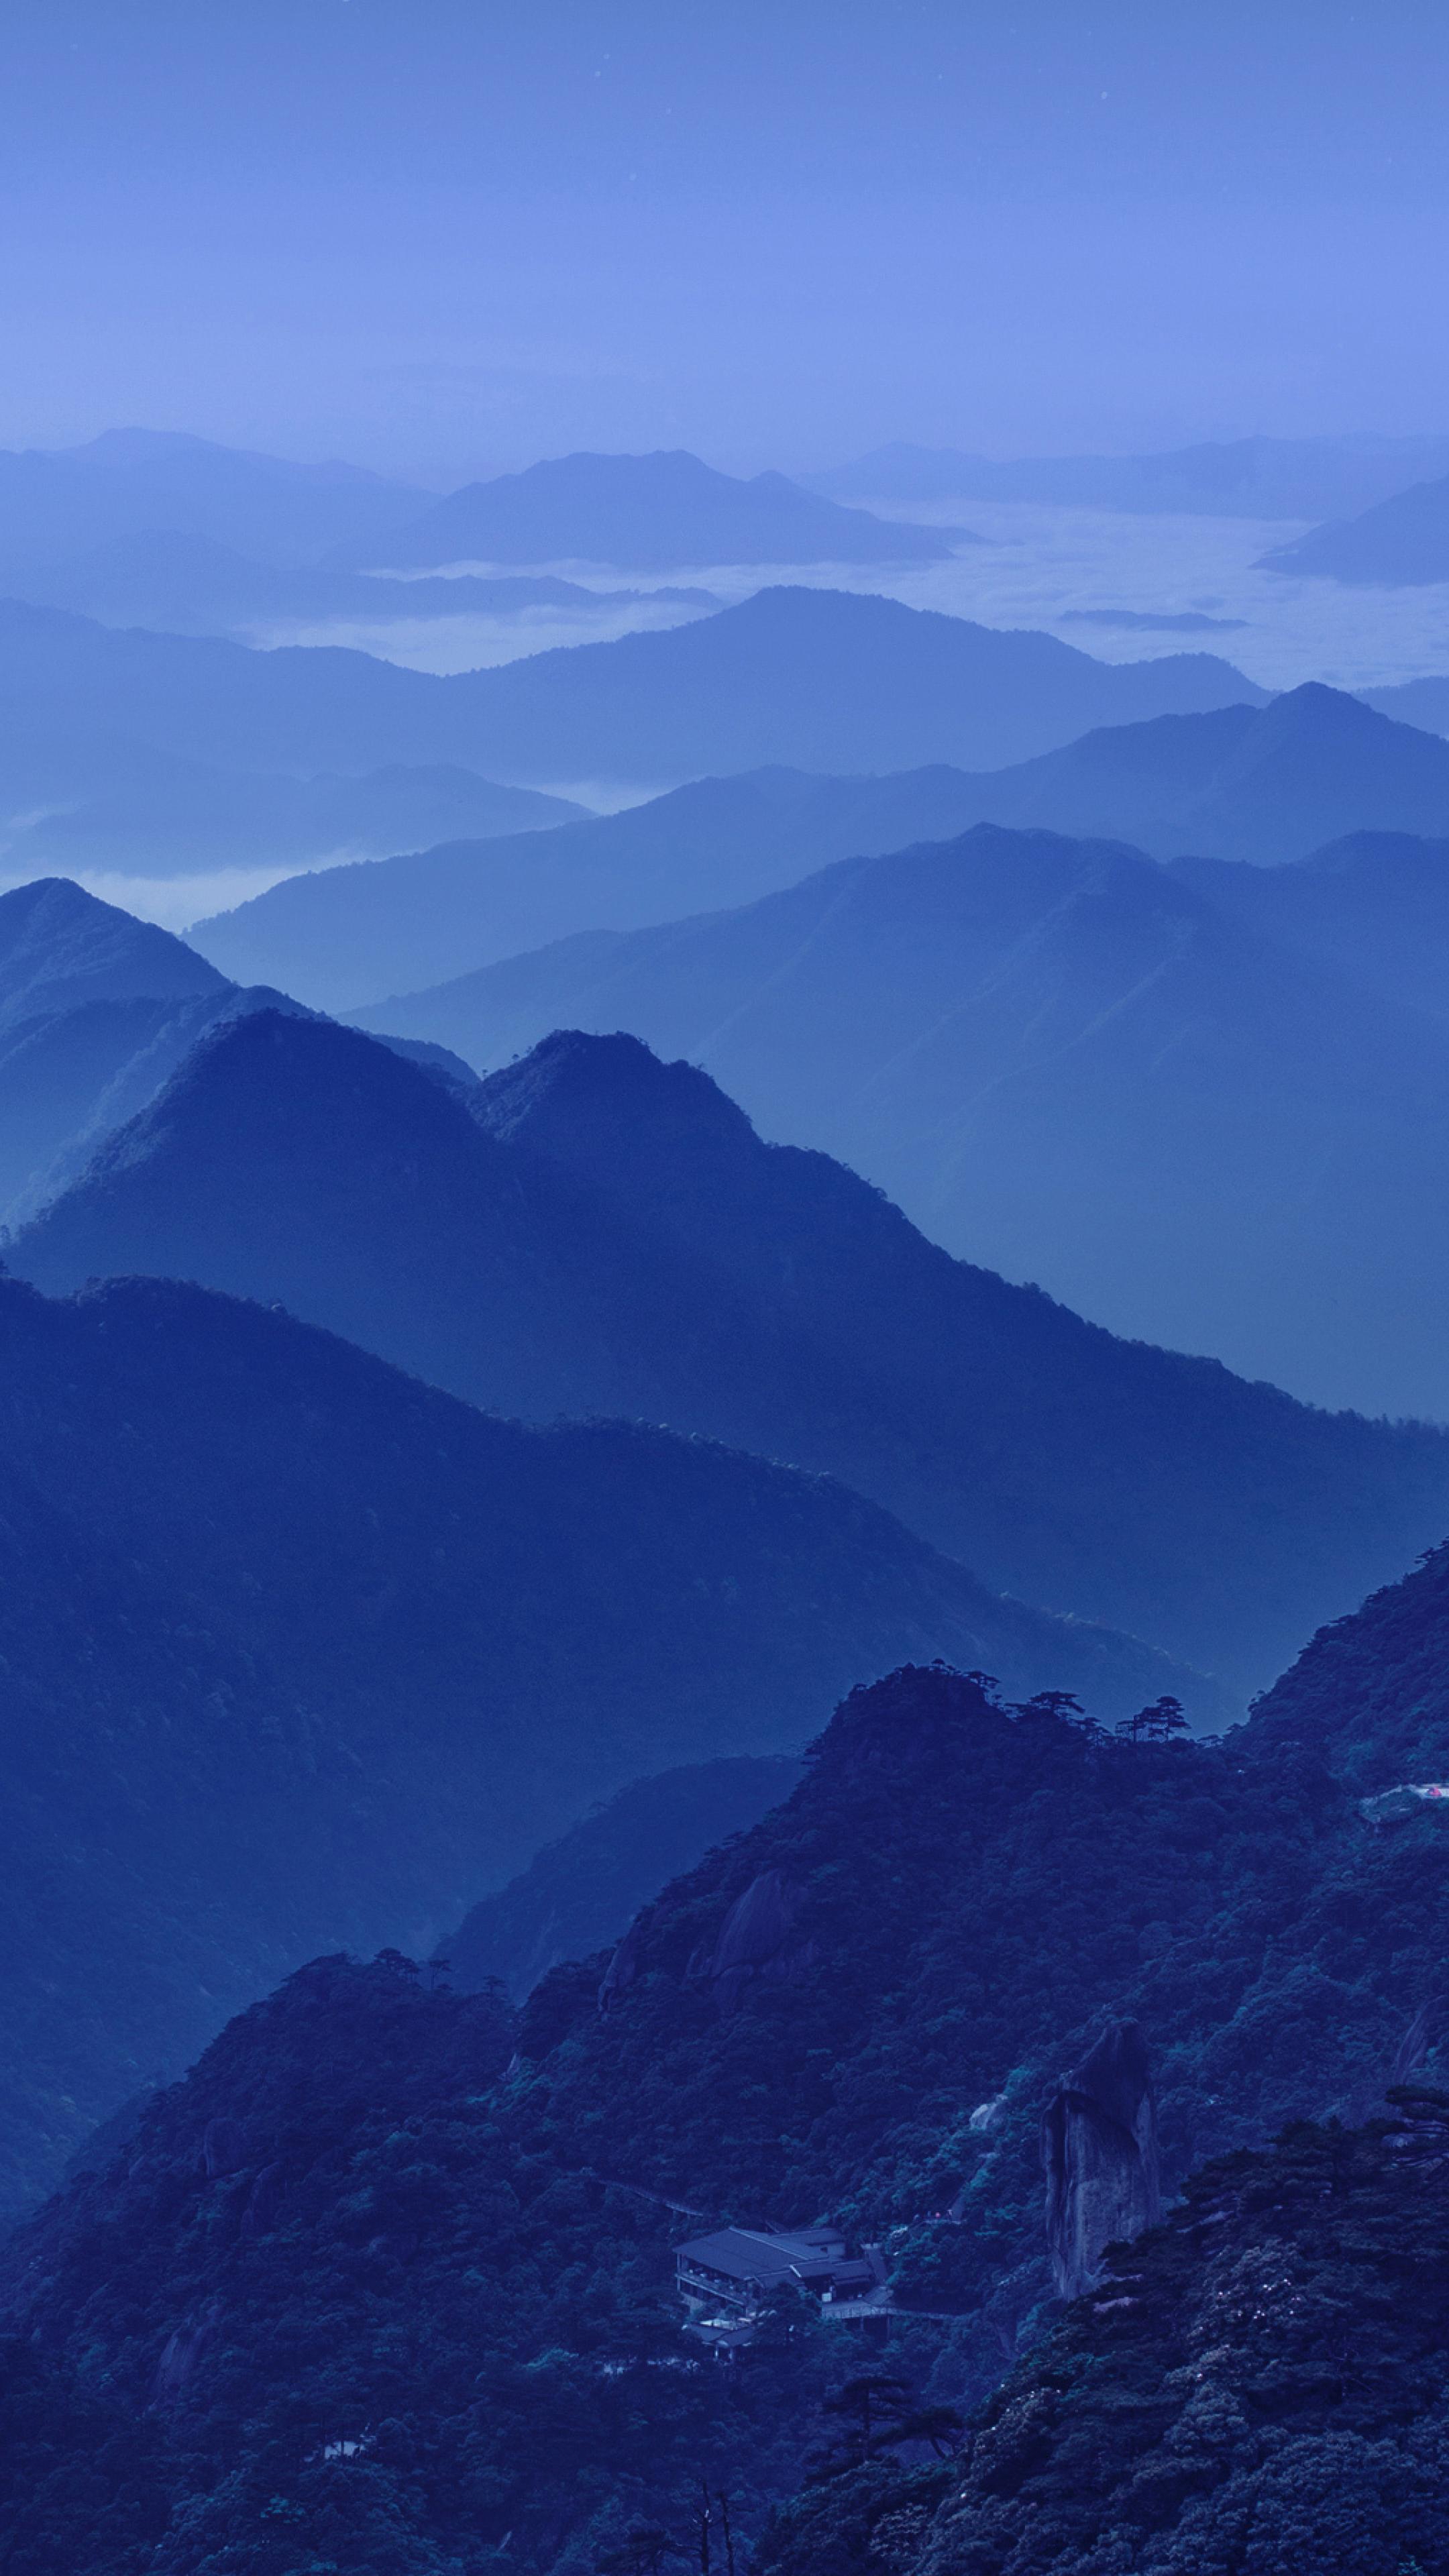 Huawei Mate 10 Wallpapers: Huawei Mate 10 Cold Night Mountains Stock, Full HD 2K